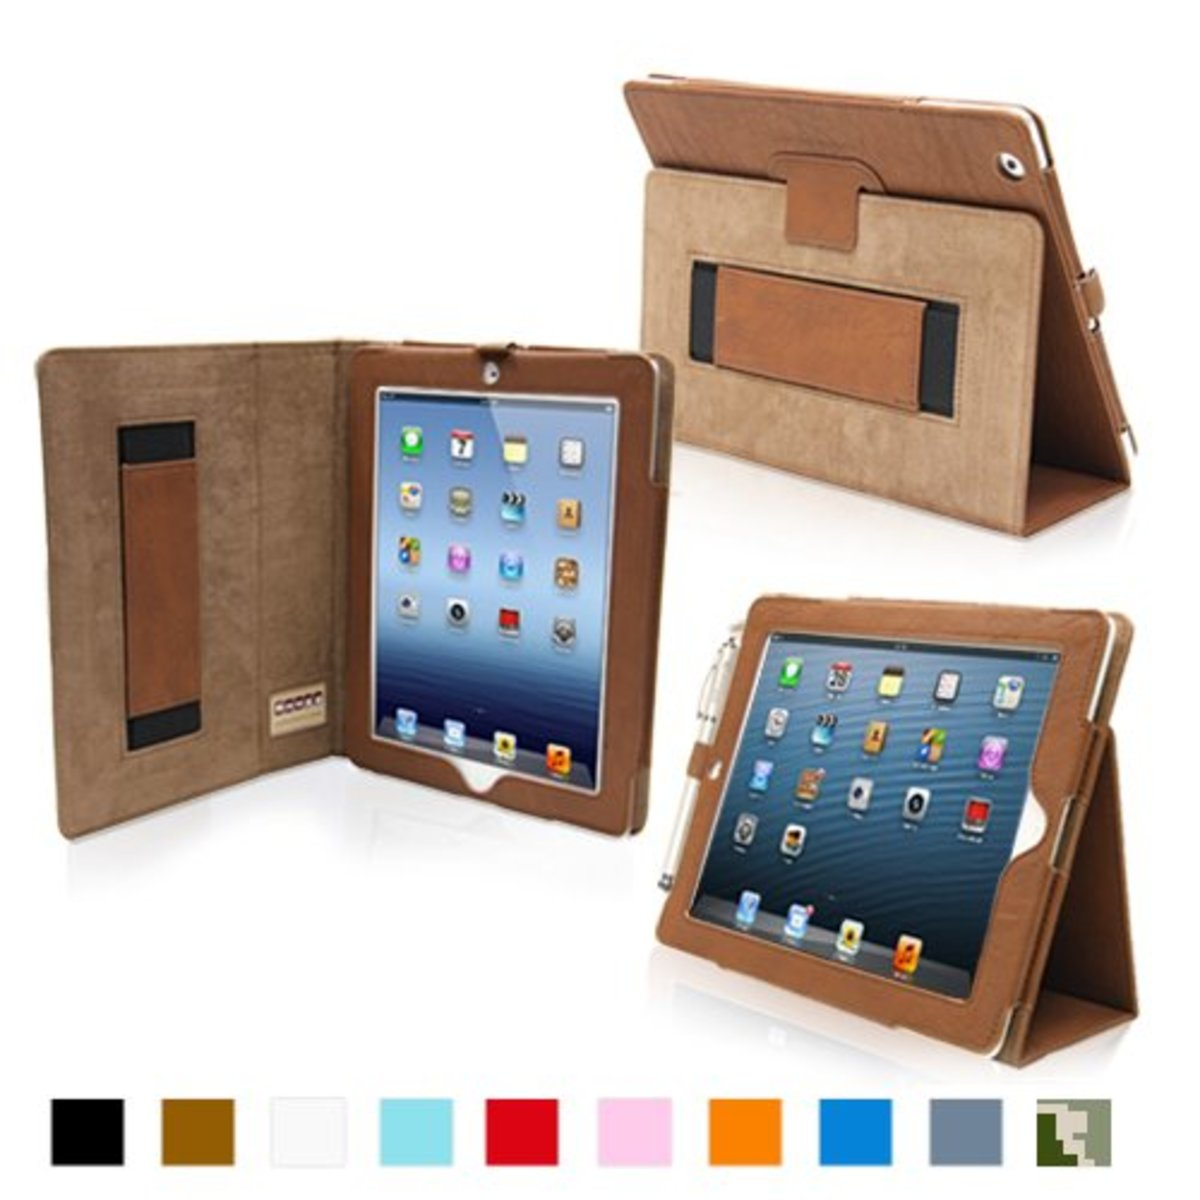 Snugg iPad Case